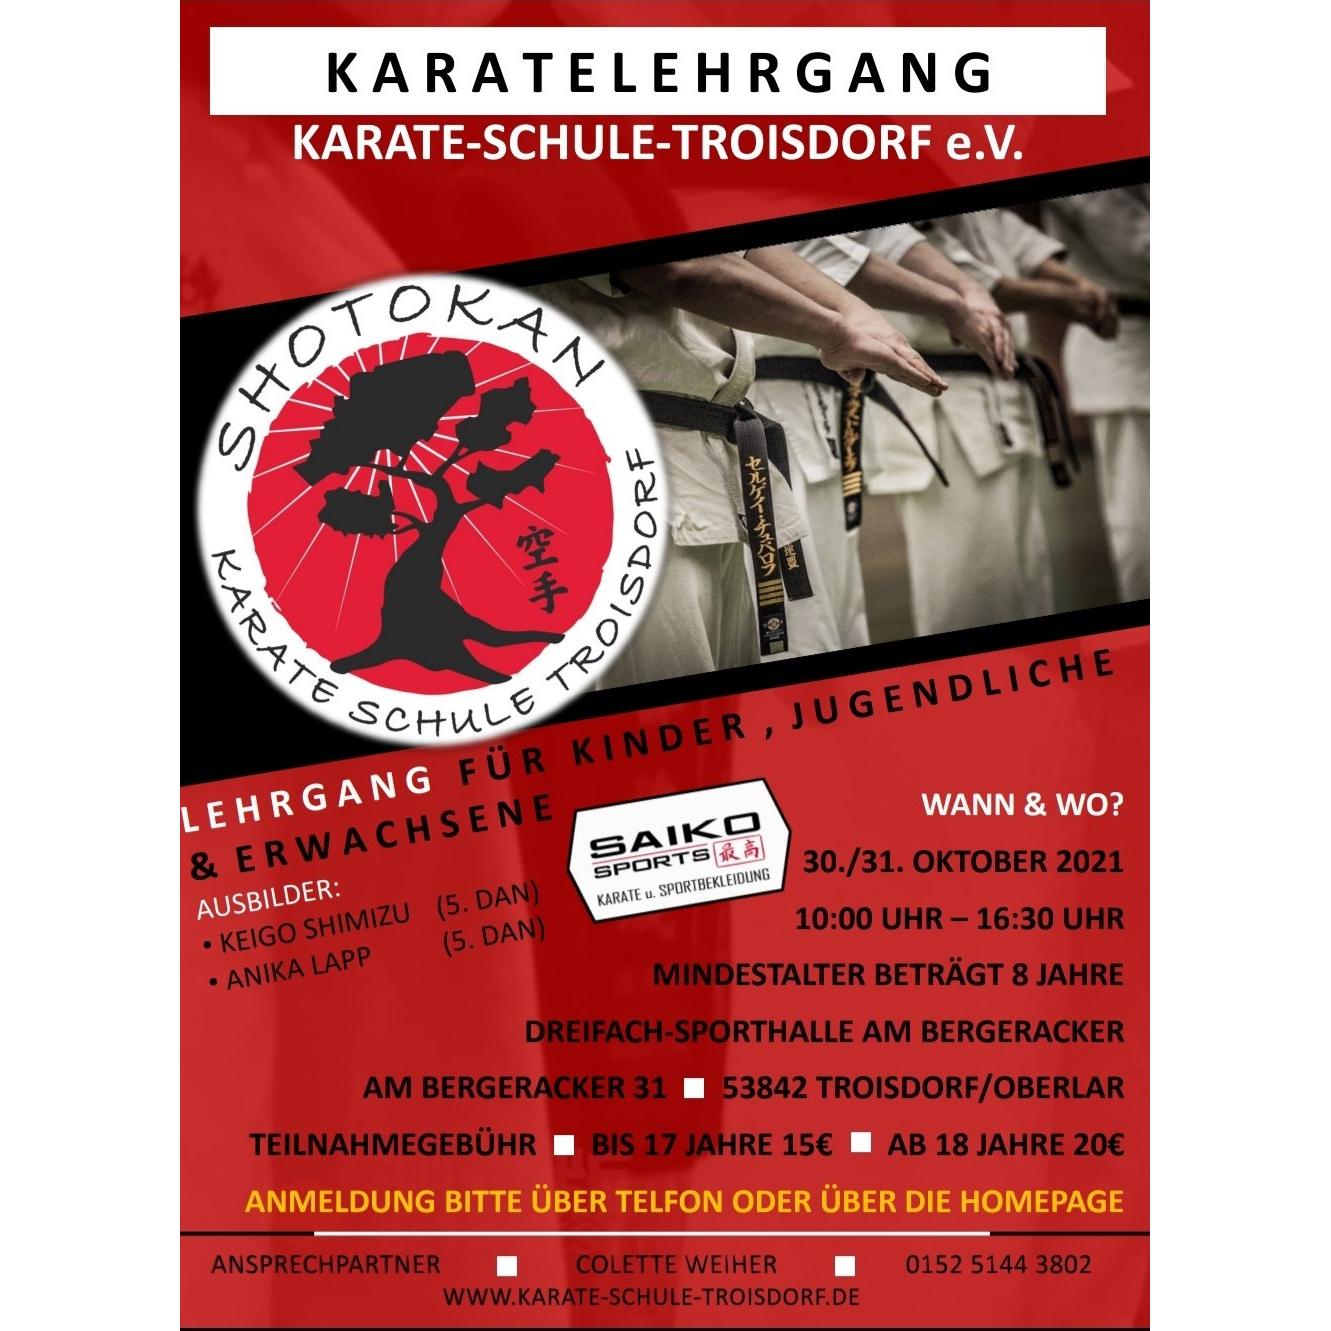 karate lehrgang troisdorf